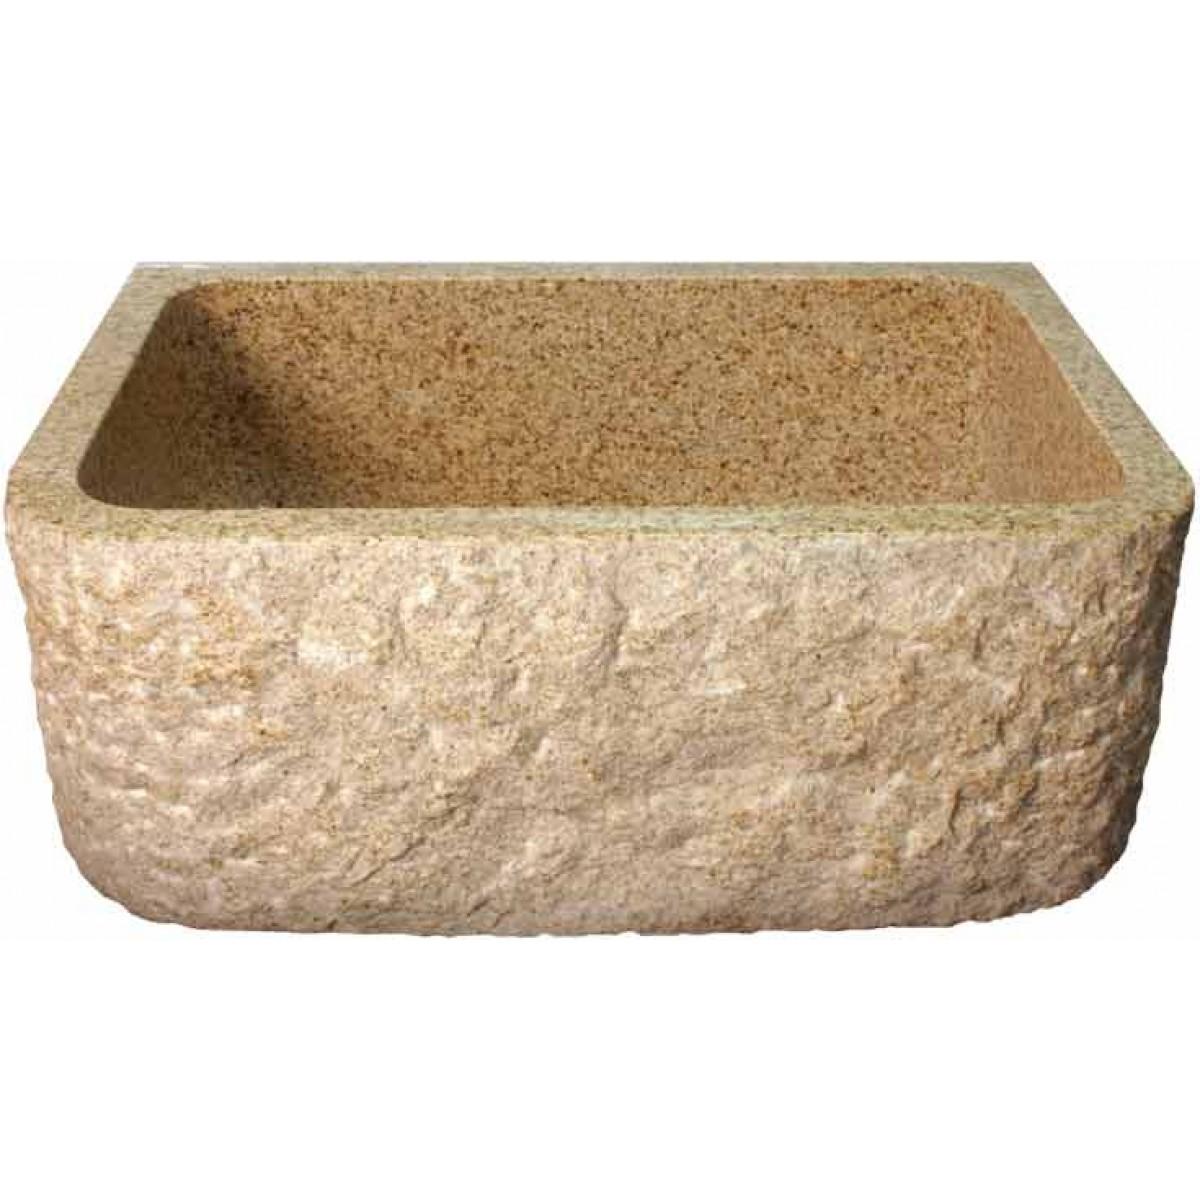 Rockwell Design Stone Granite Front Apron Farm Kitchen Sink - 26-1/2 x ...